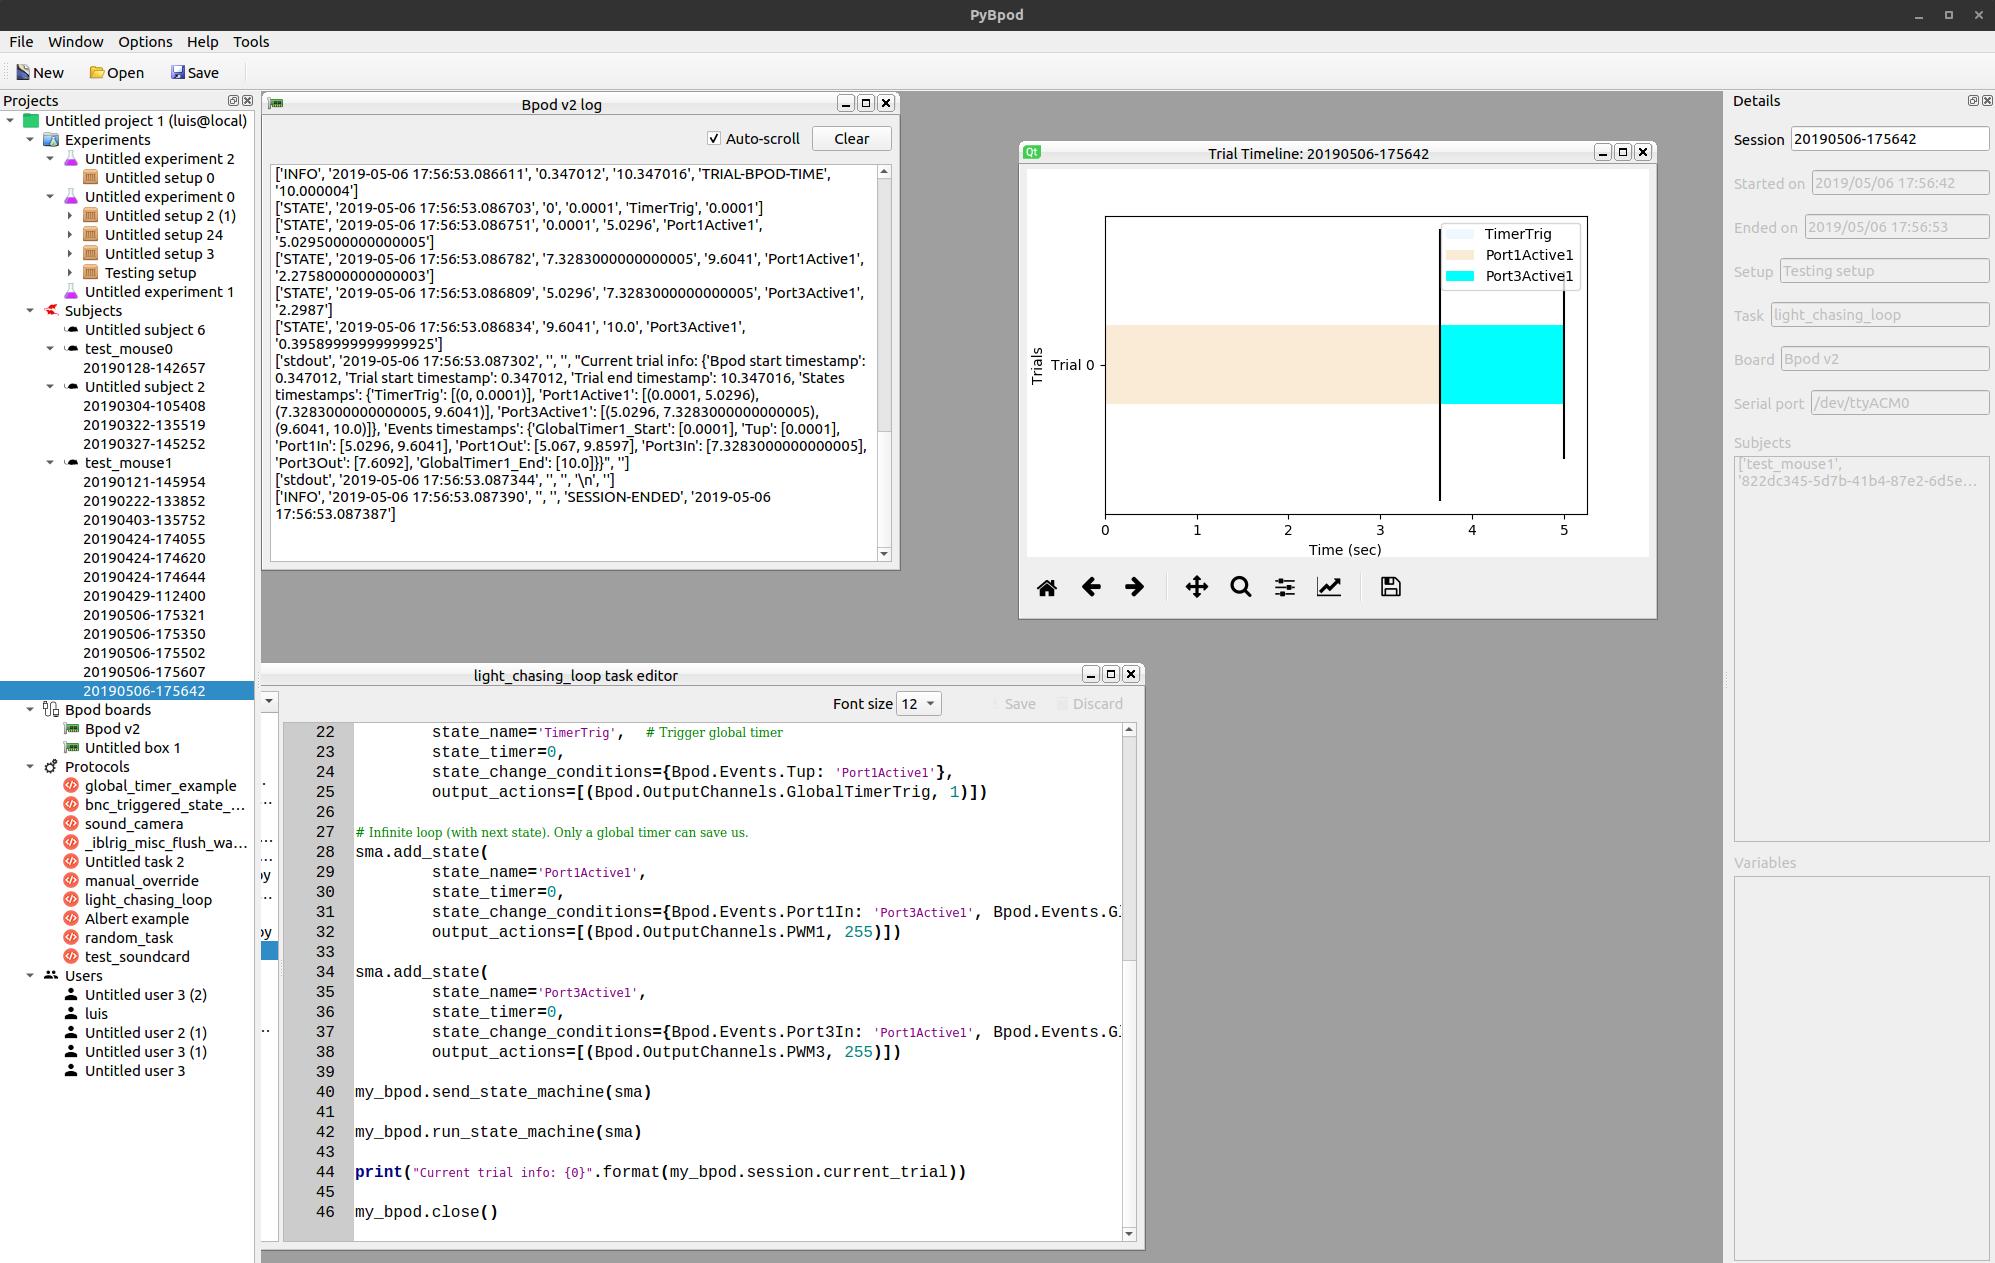 regarder 173d7 fdebd Welcome to PyBpod's documentation! — PyBpod 1.7.8 documentation